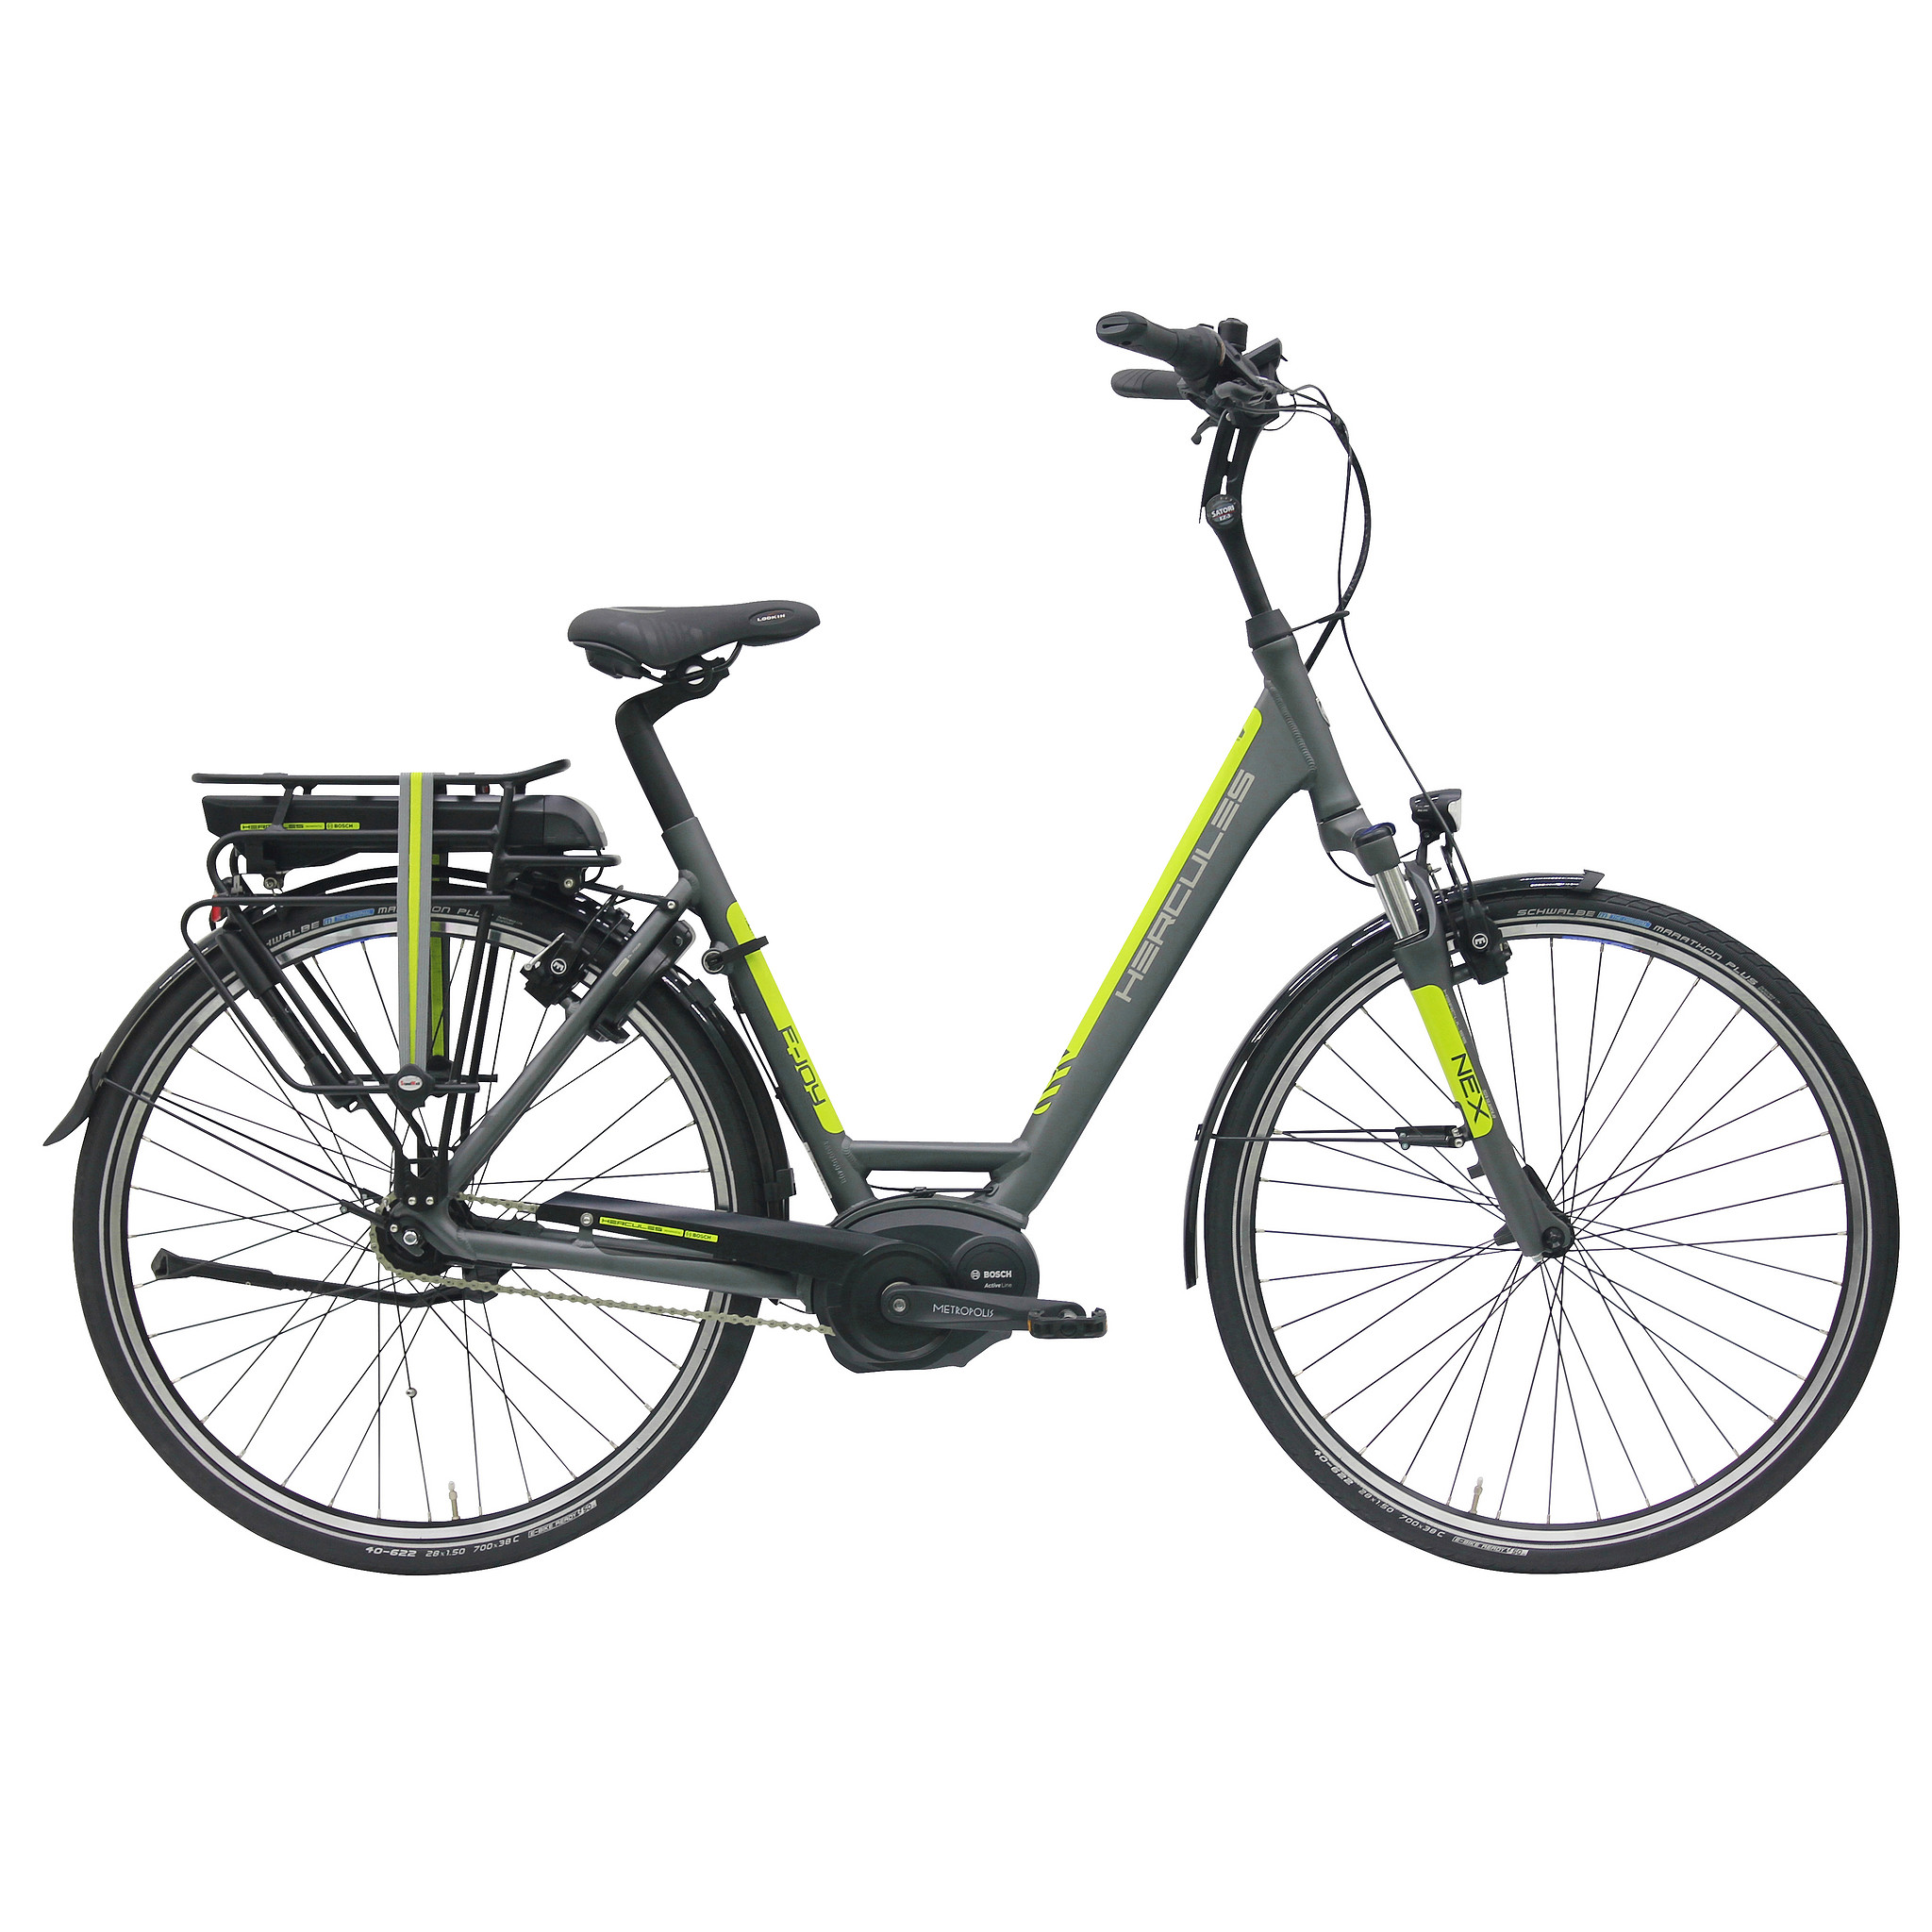 Hercules Elektrische fiets E-Joy mat grijs 396 Watt Grijs